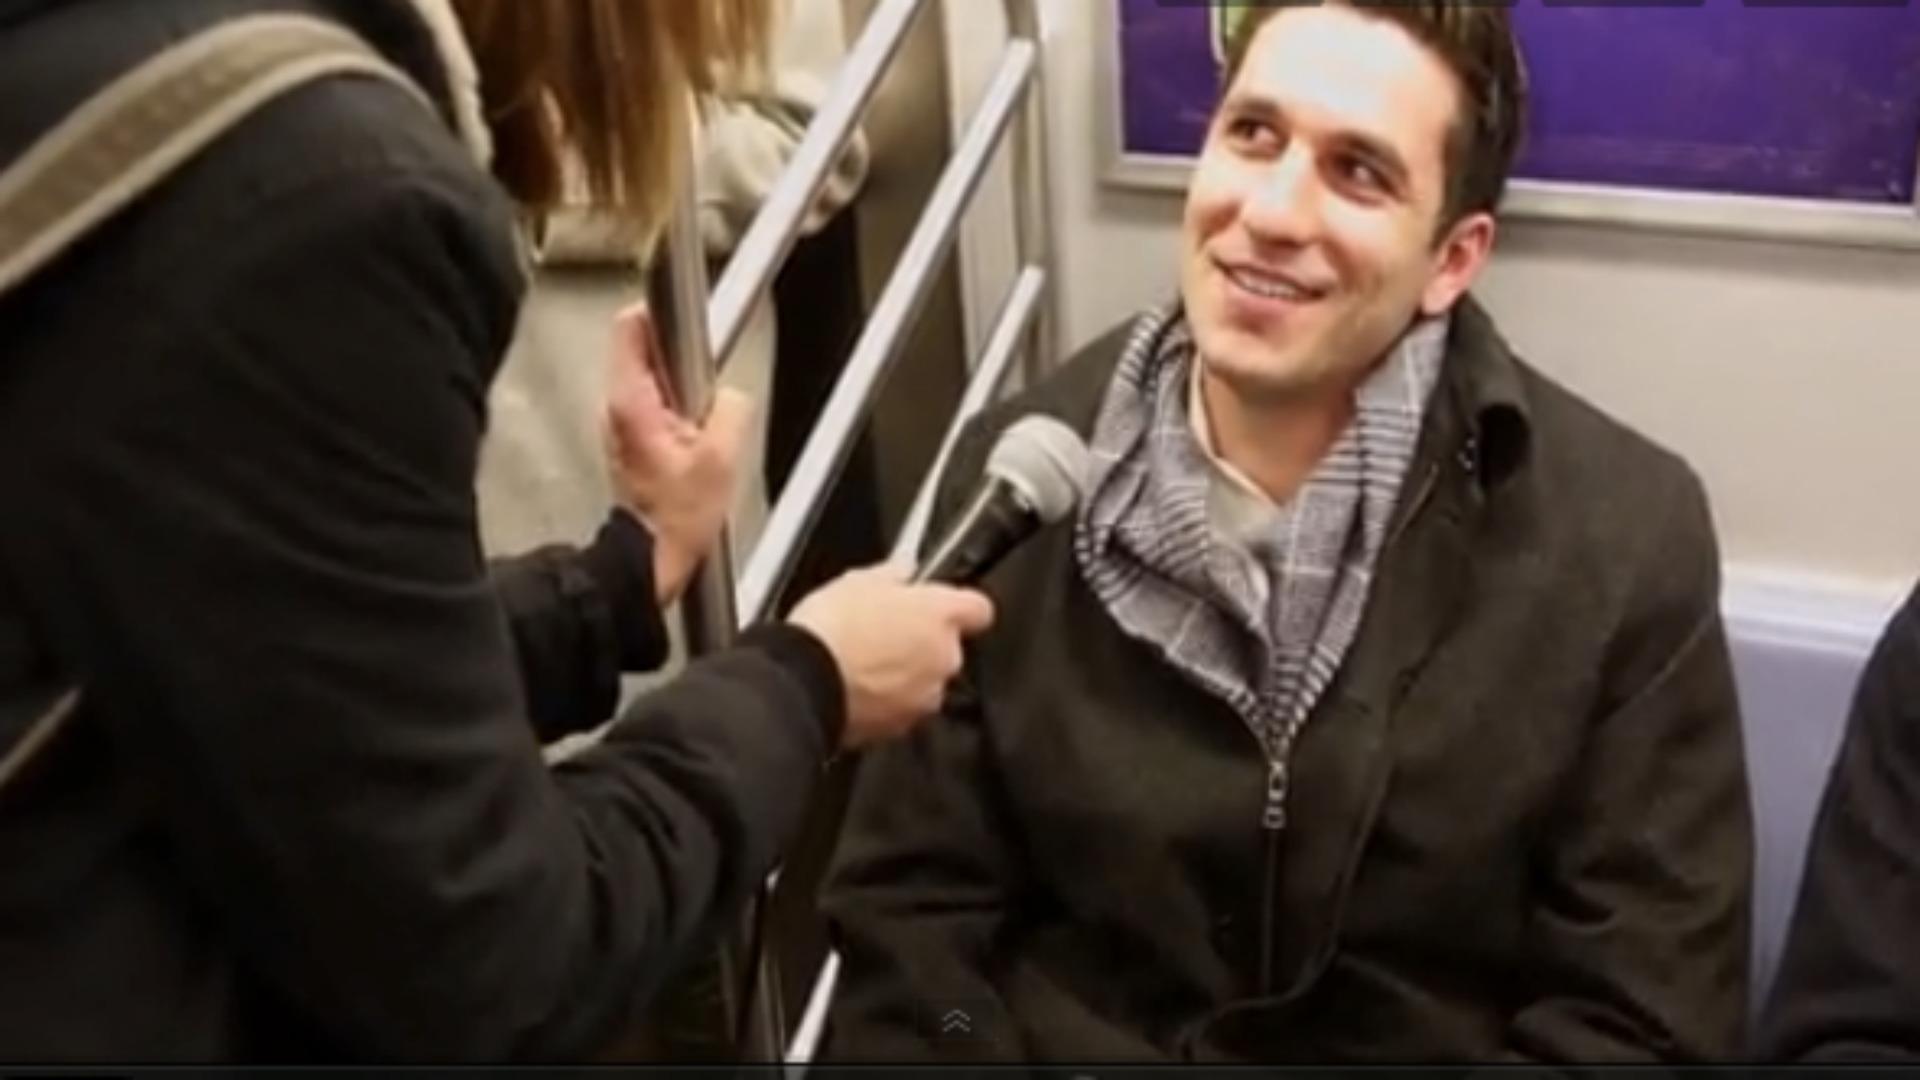 Man Spreading Urban Dictionary